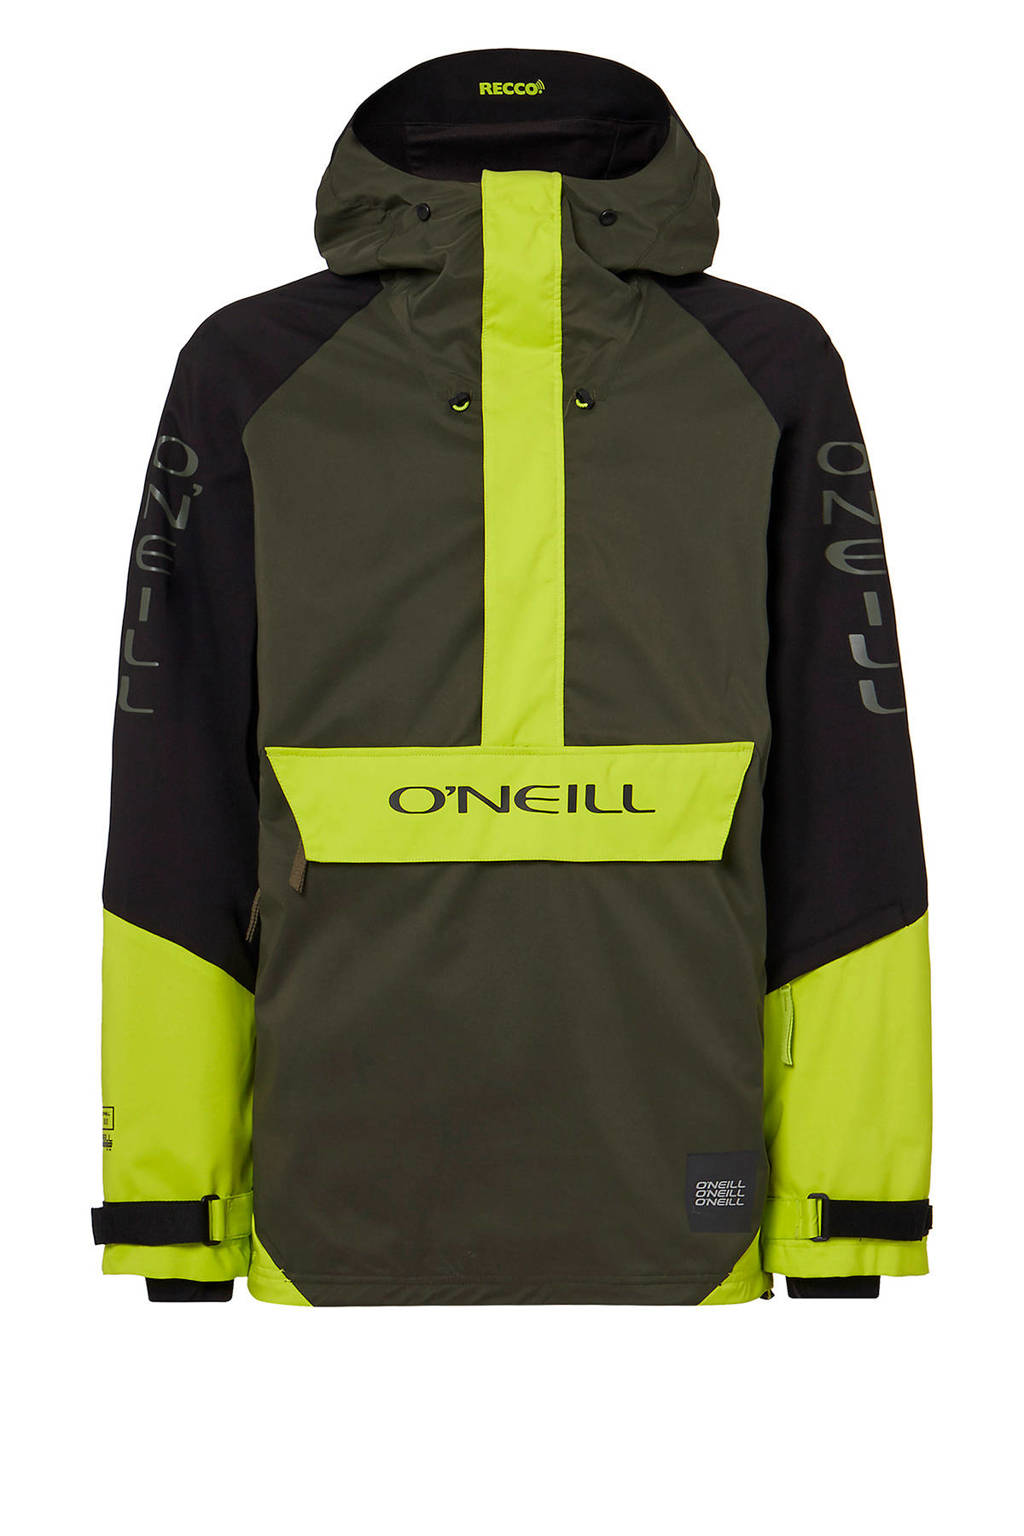 O'Neill anorak Original kaki/limegroen/zwart, Kaki/limegroen/zwart